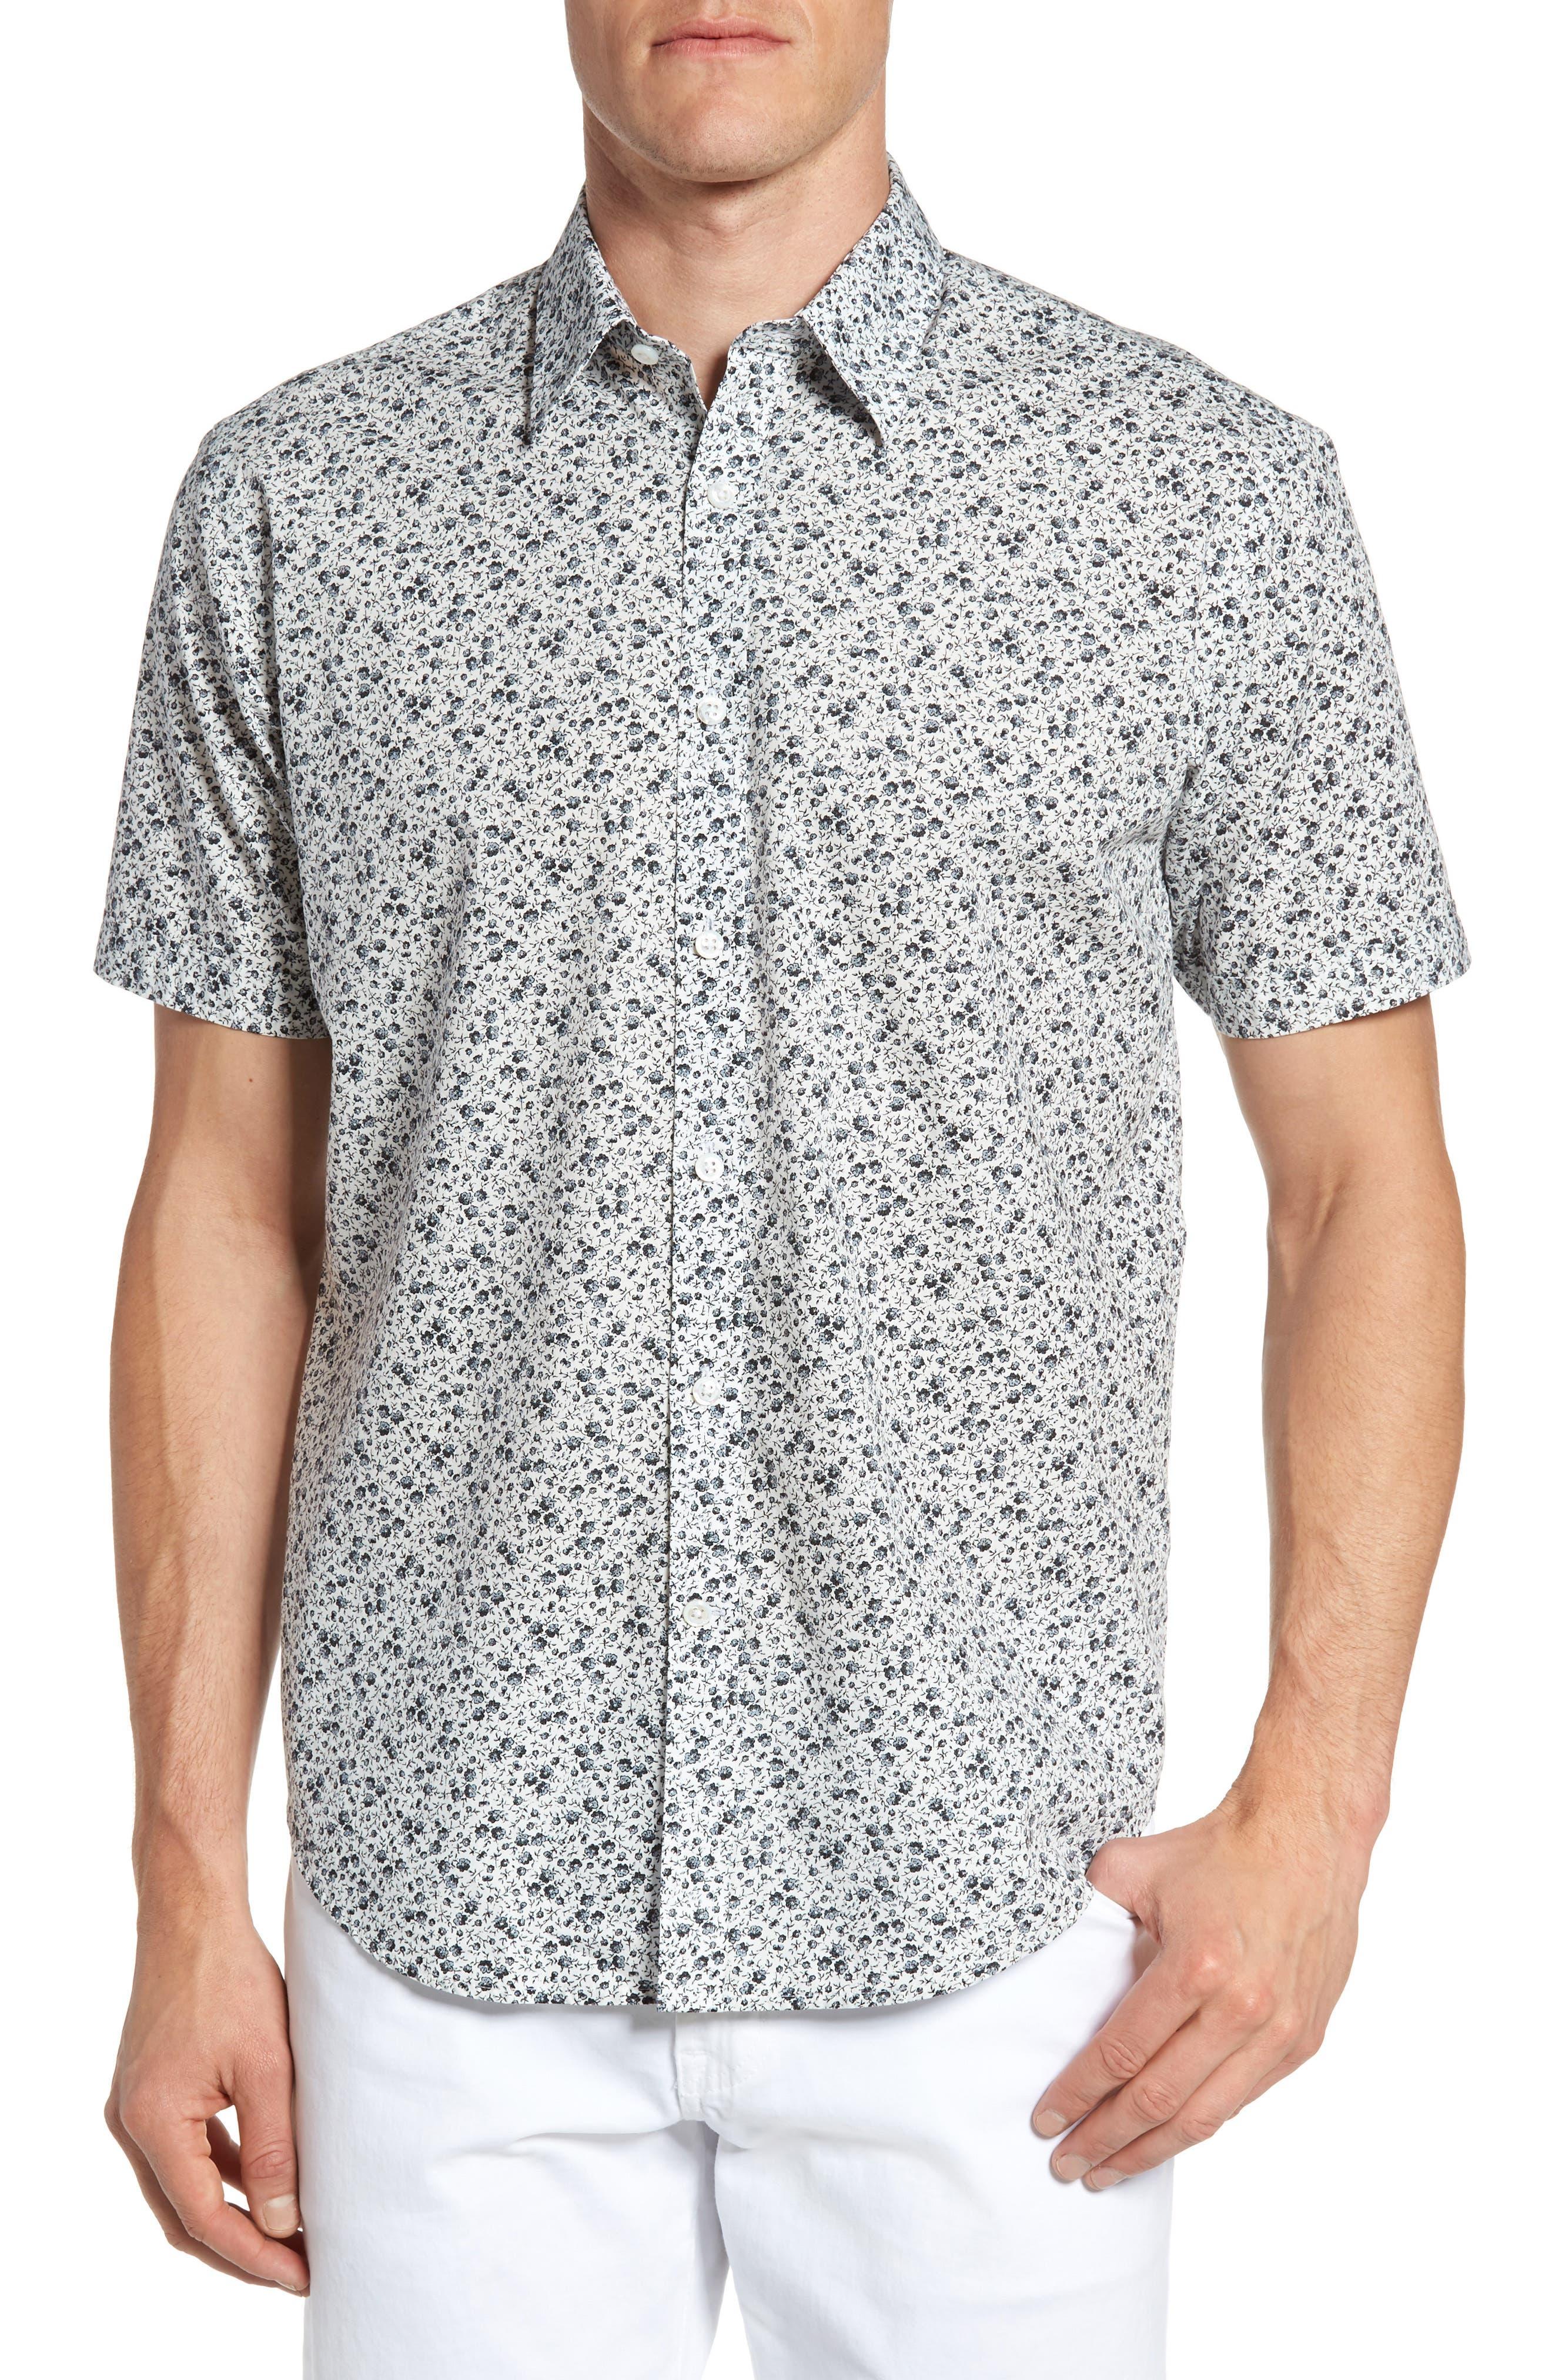 James Campbell Floral Print Sport Shirt